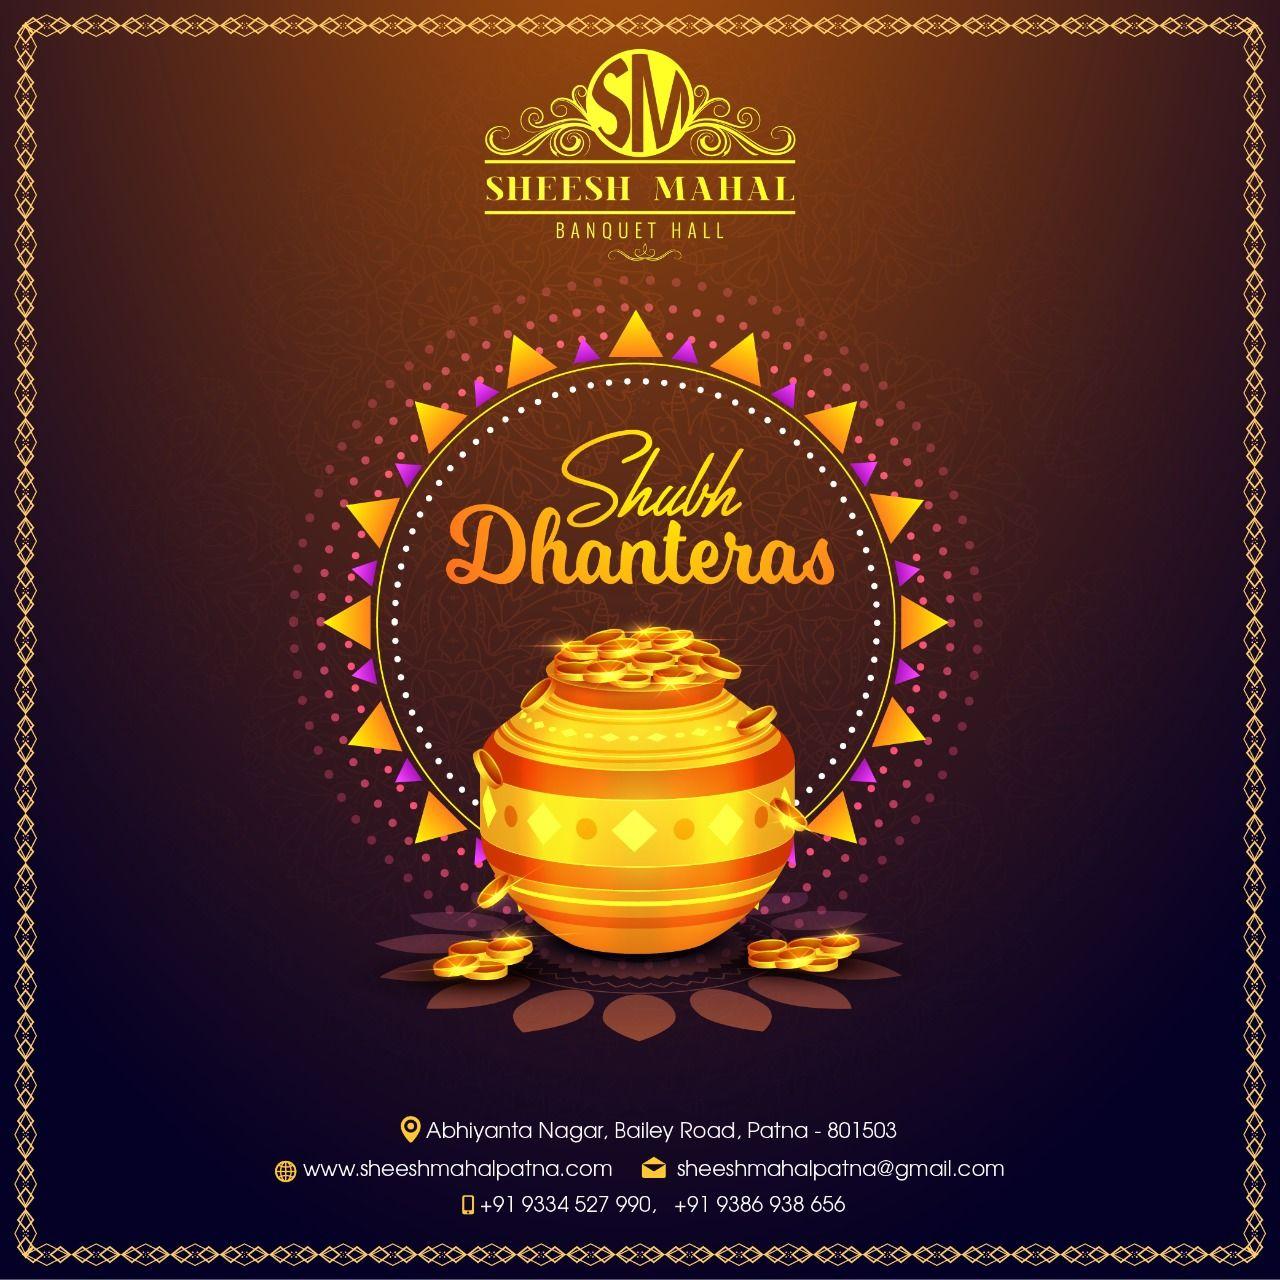 Happy Dhanteras! HappyDhanteras2018 happydhanteras